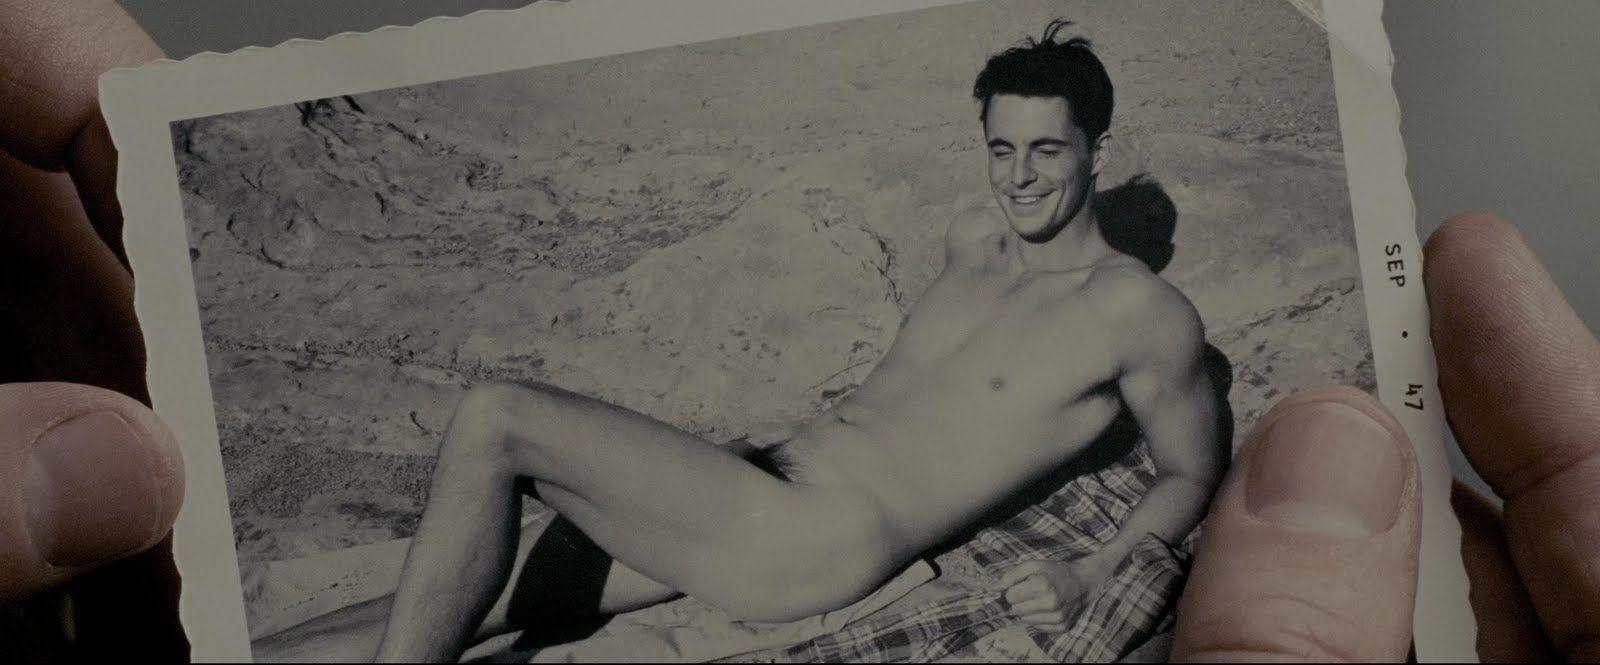 Really surprises. Matthew goode naked body consider